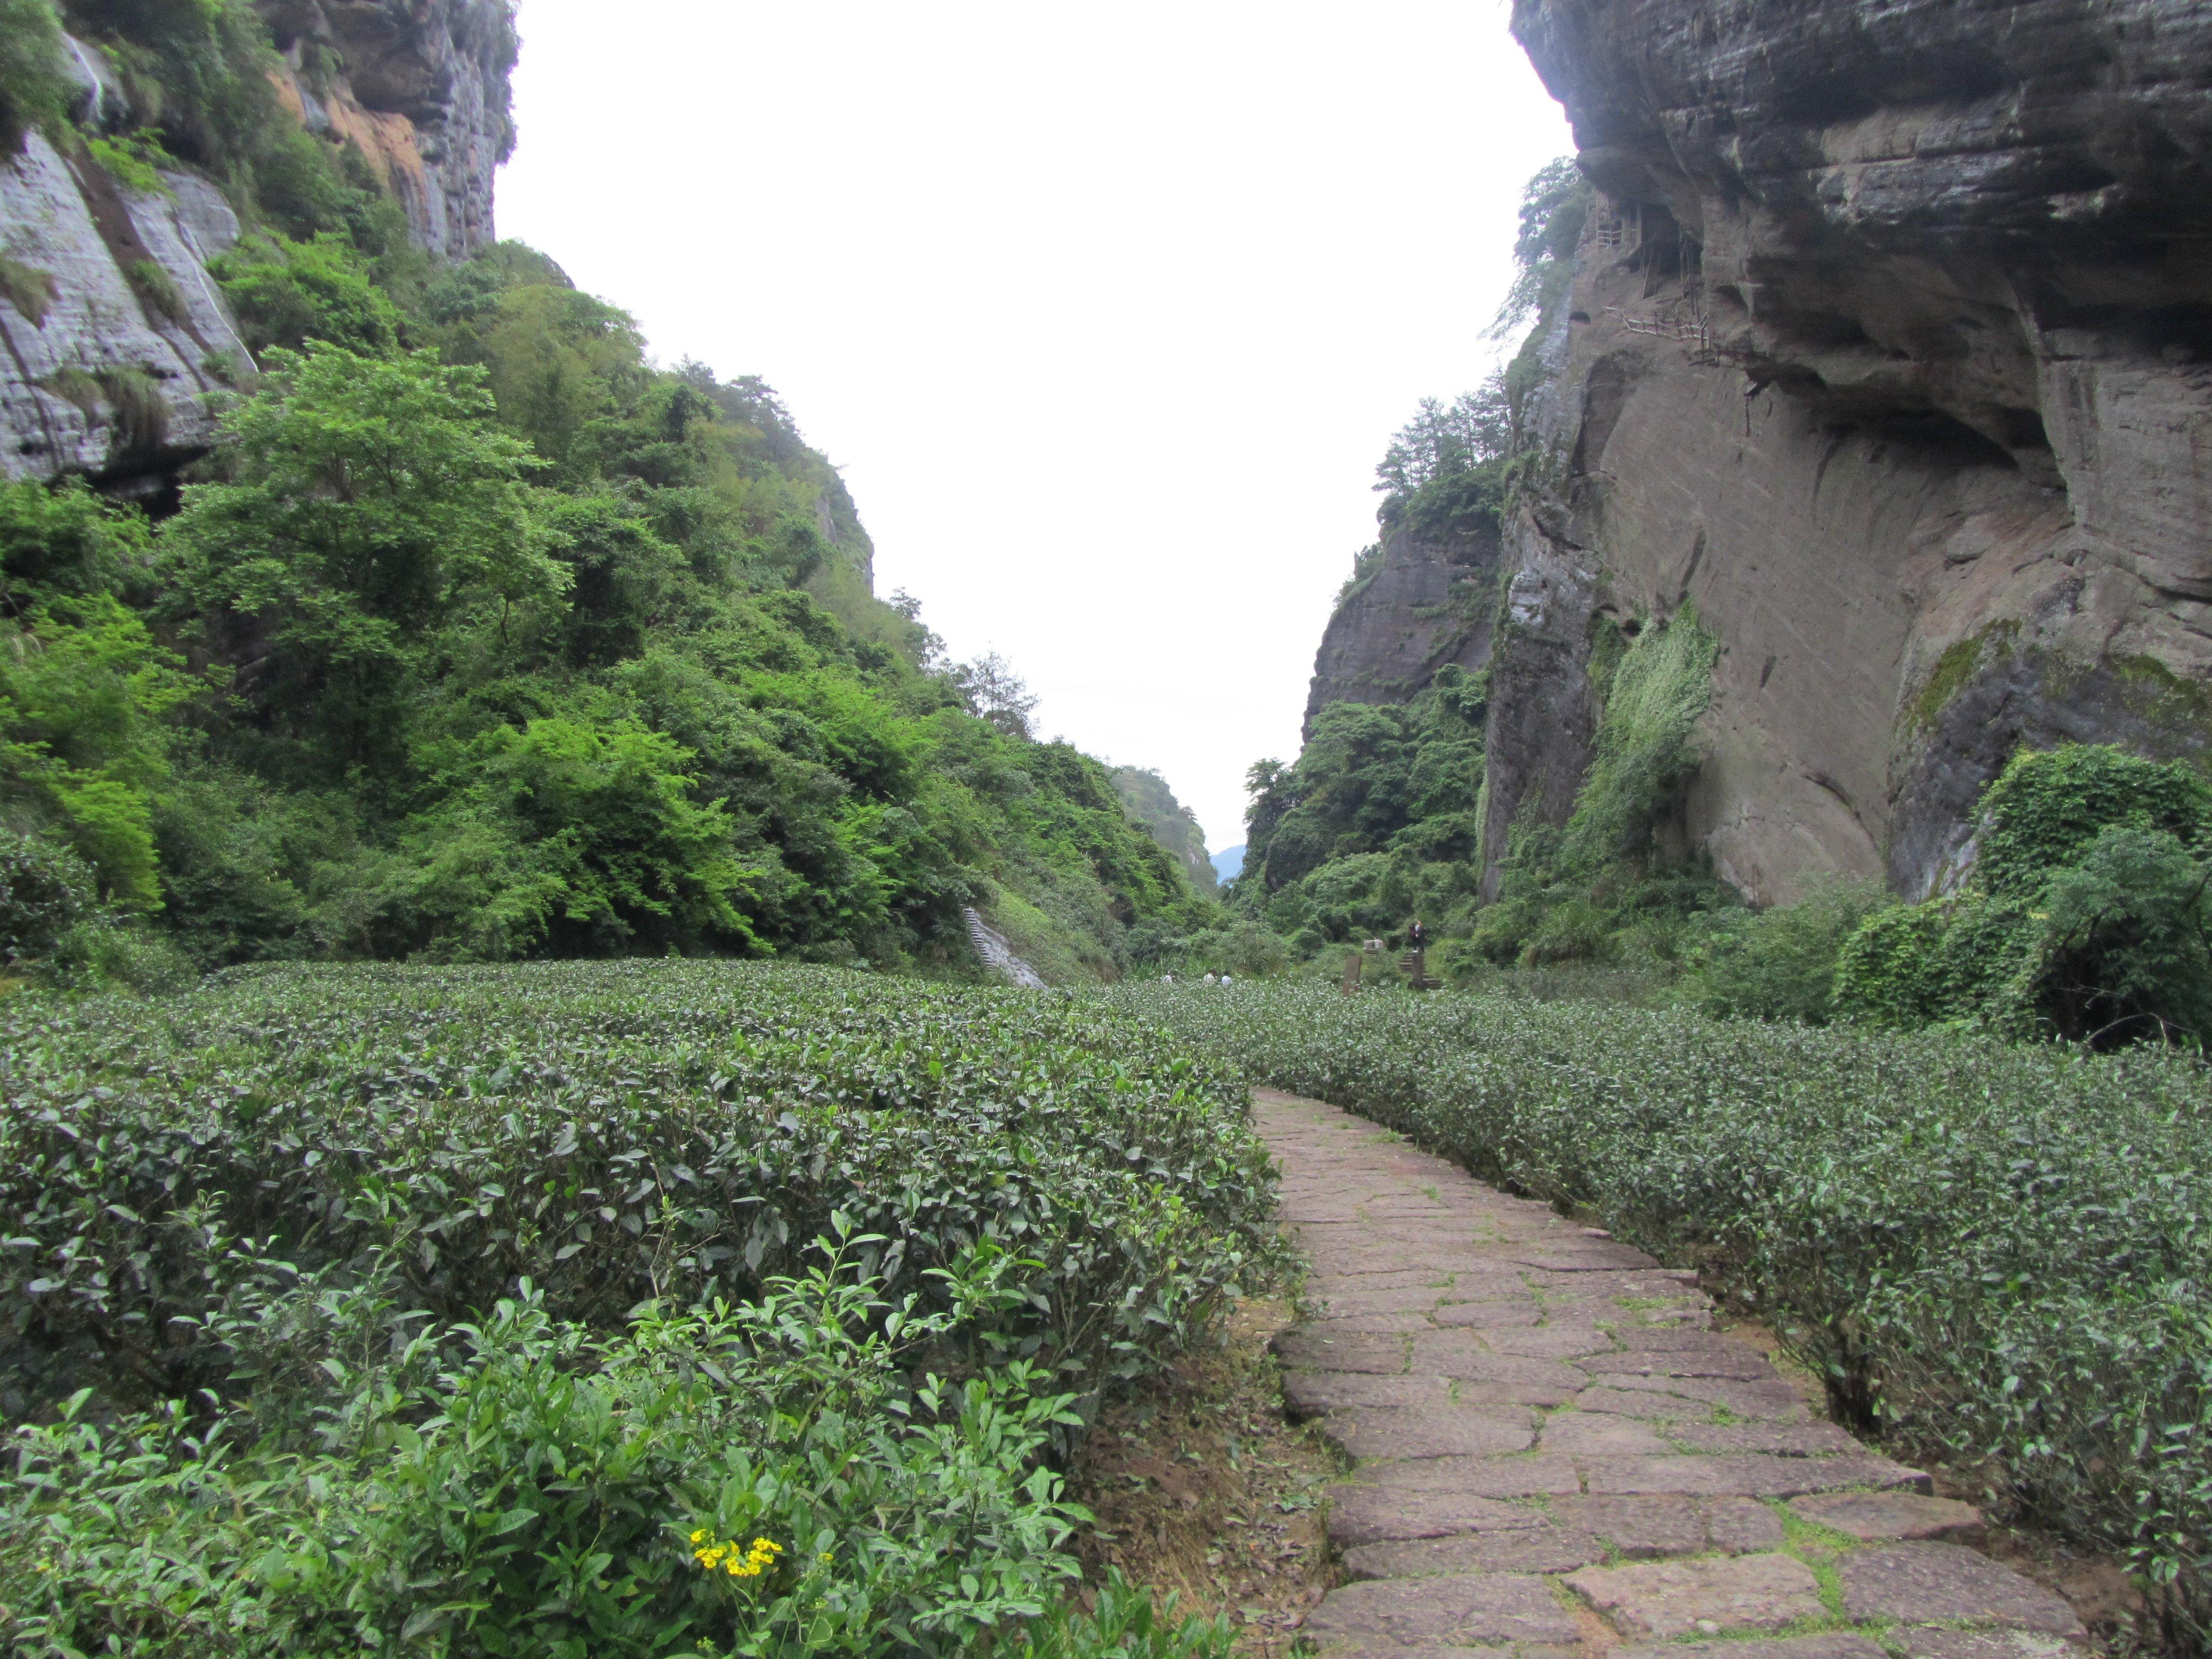 The Six Pillars of Cha Tao (The Way of Tea)